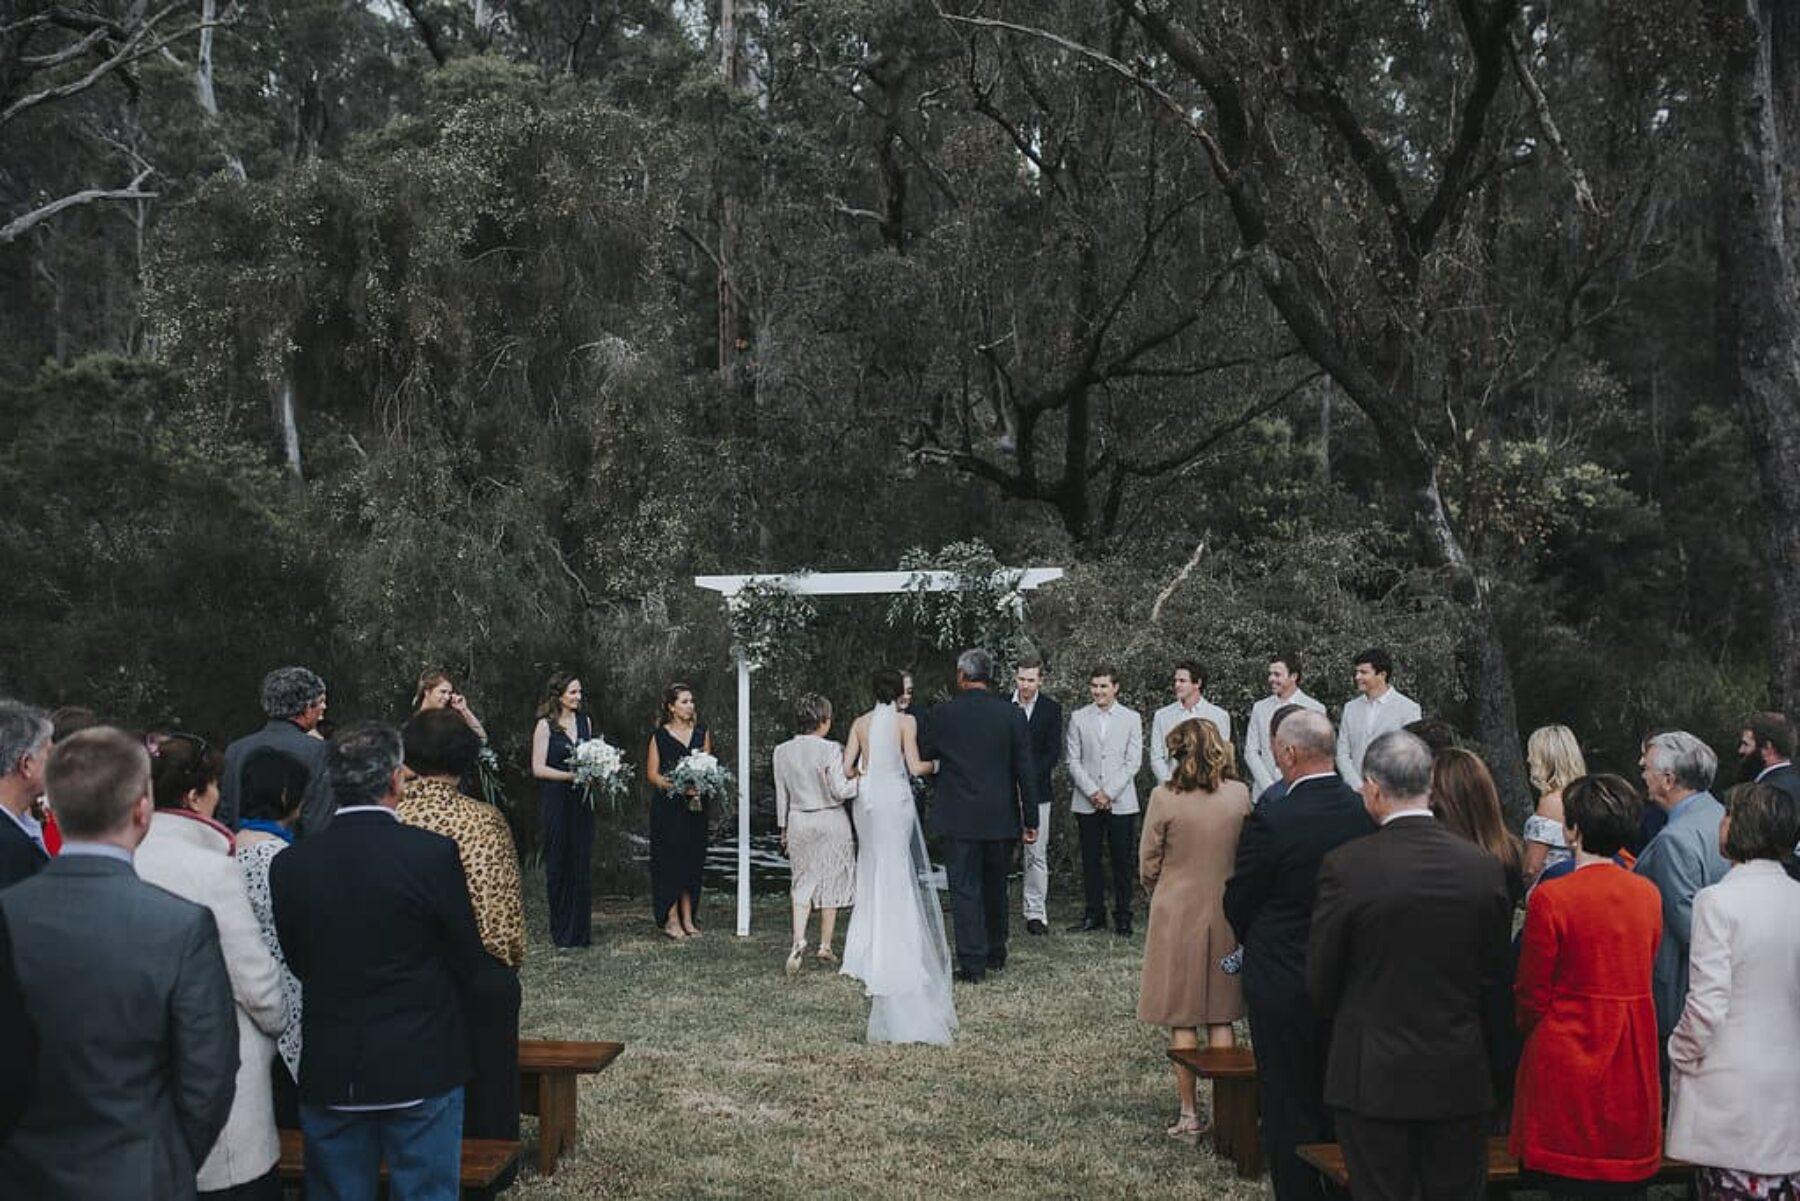 Stylish Pemberton wedding at Clover Cottage